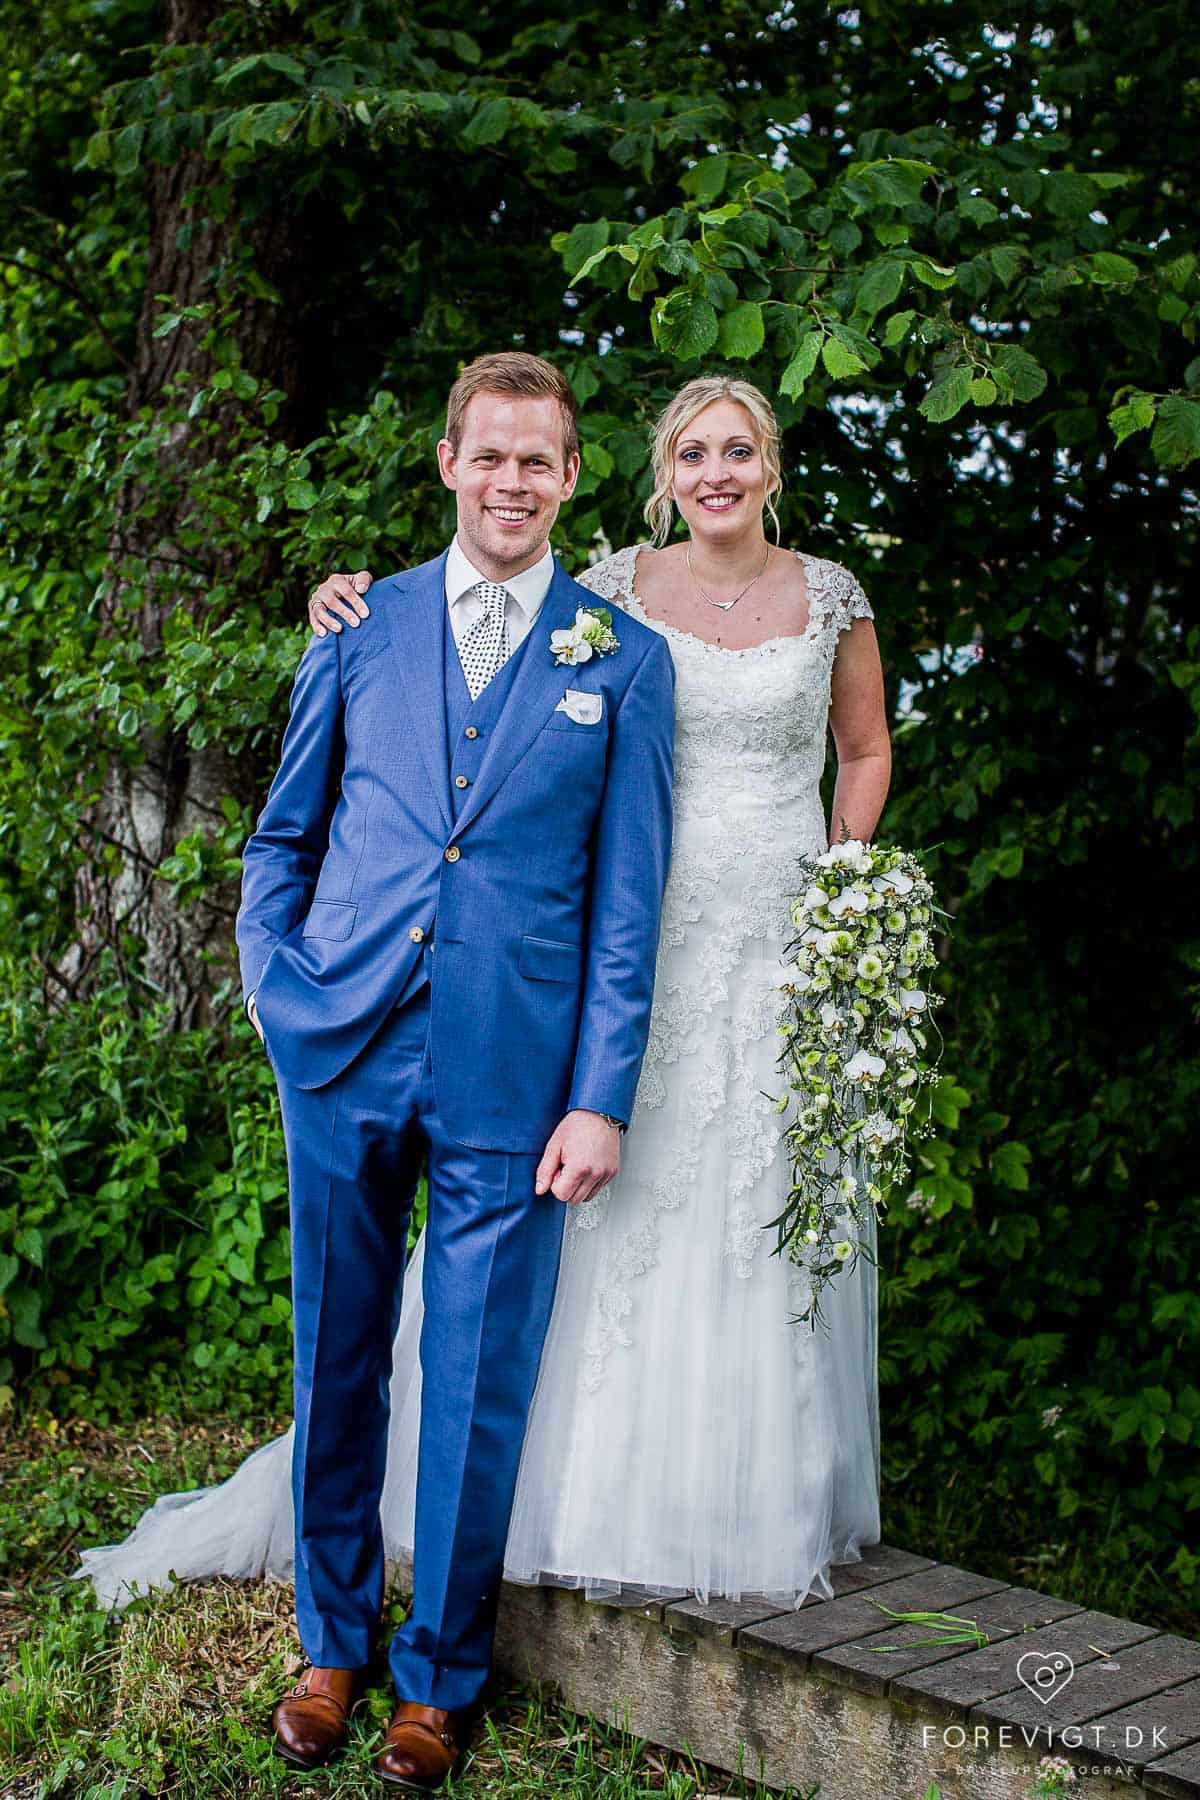 Hotel Skanderborghus bryllup | Bryllupsbilleder, Bryllup